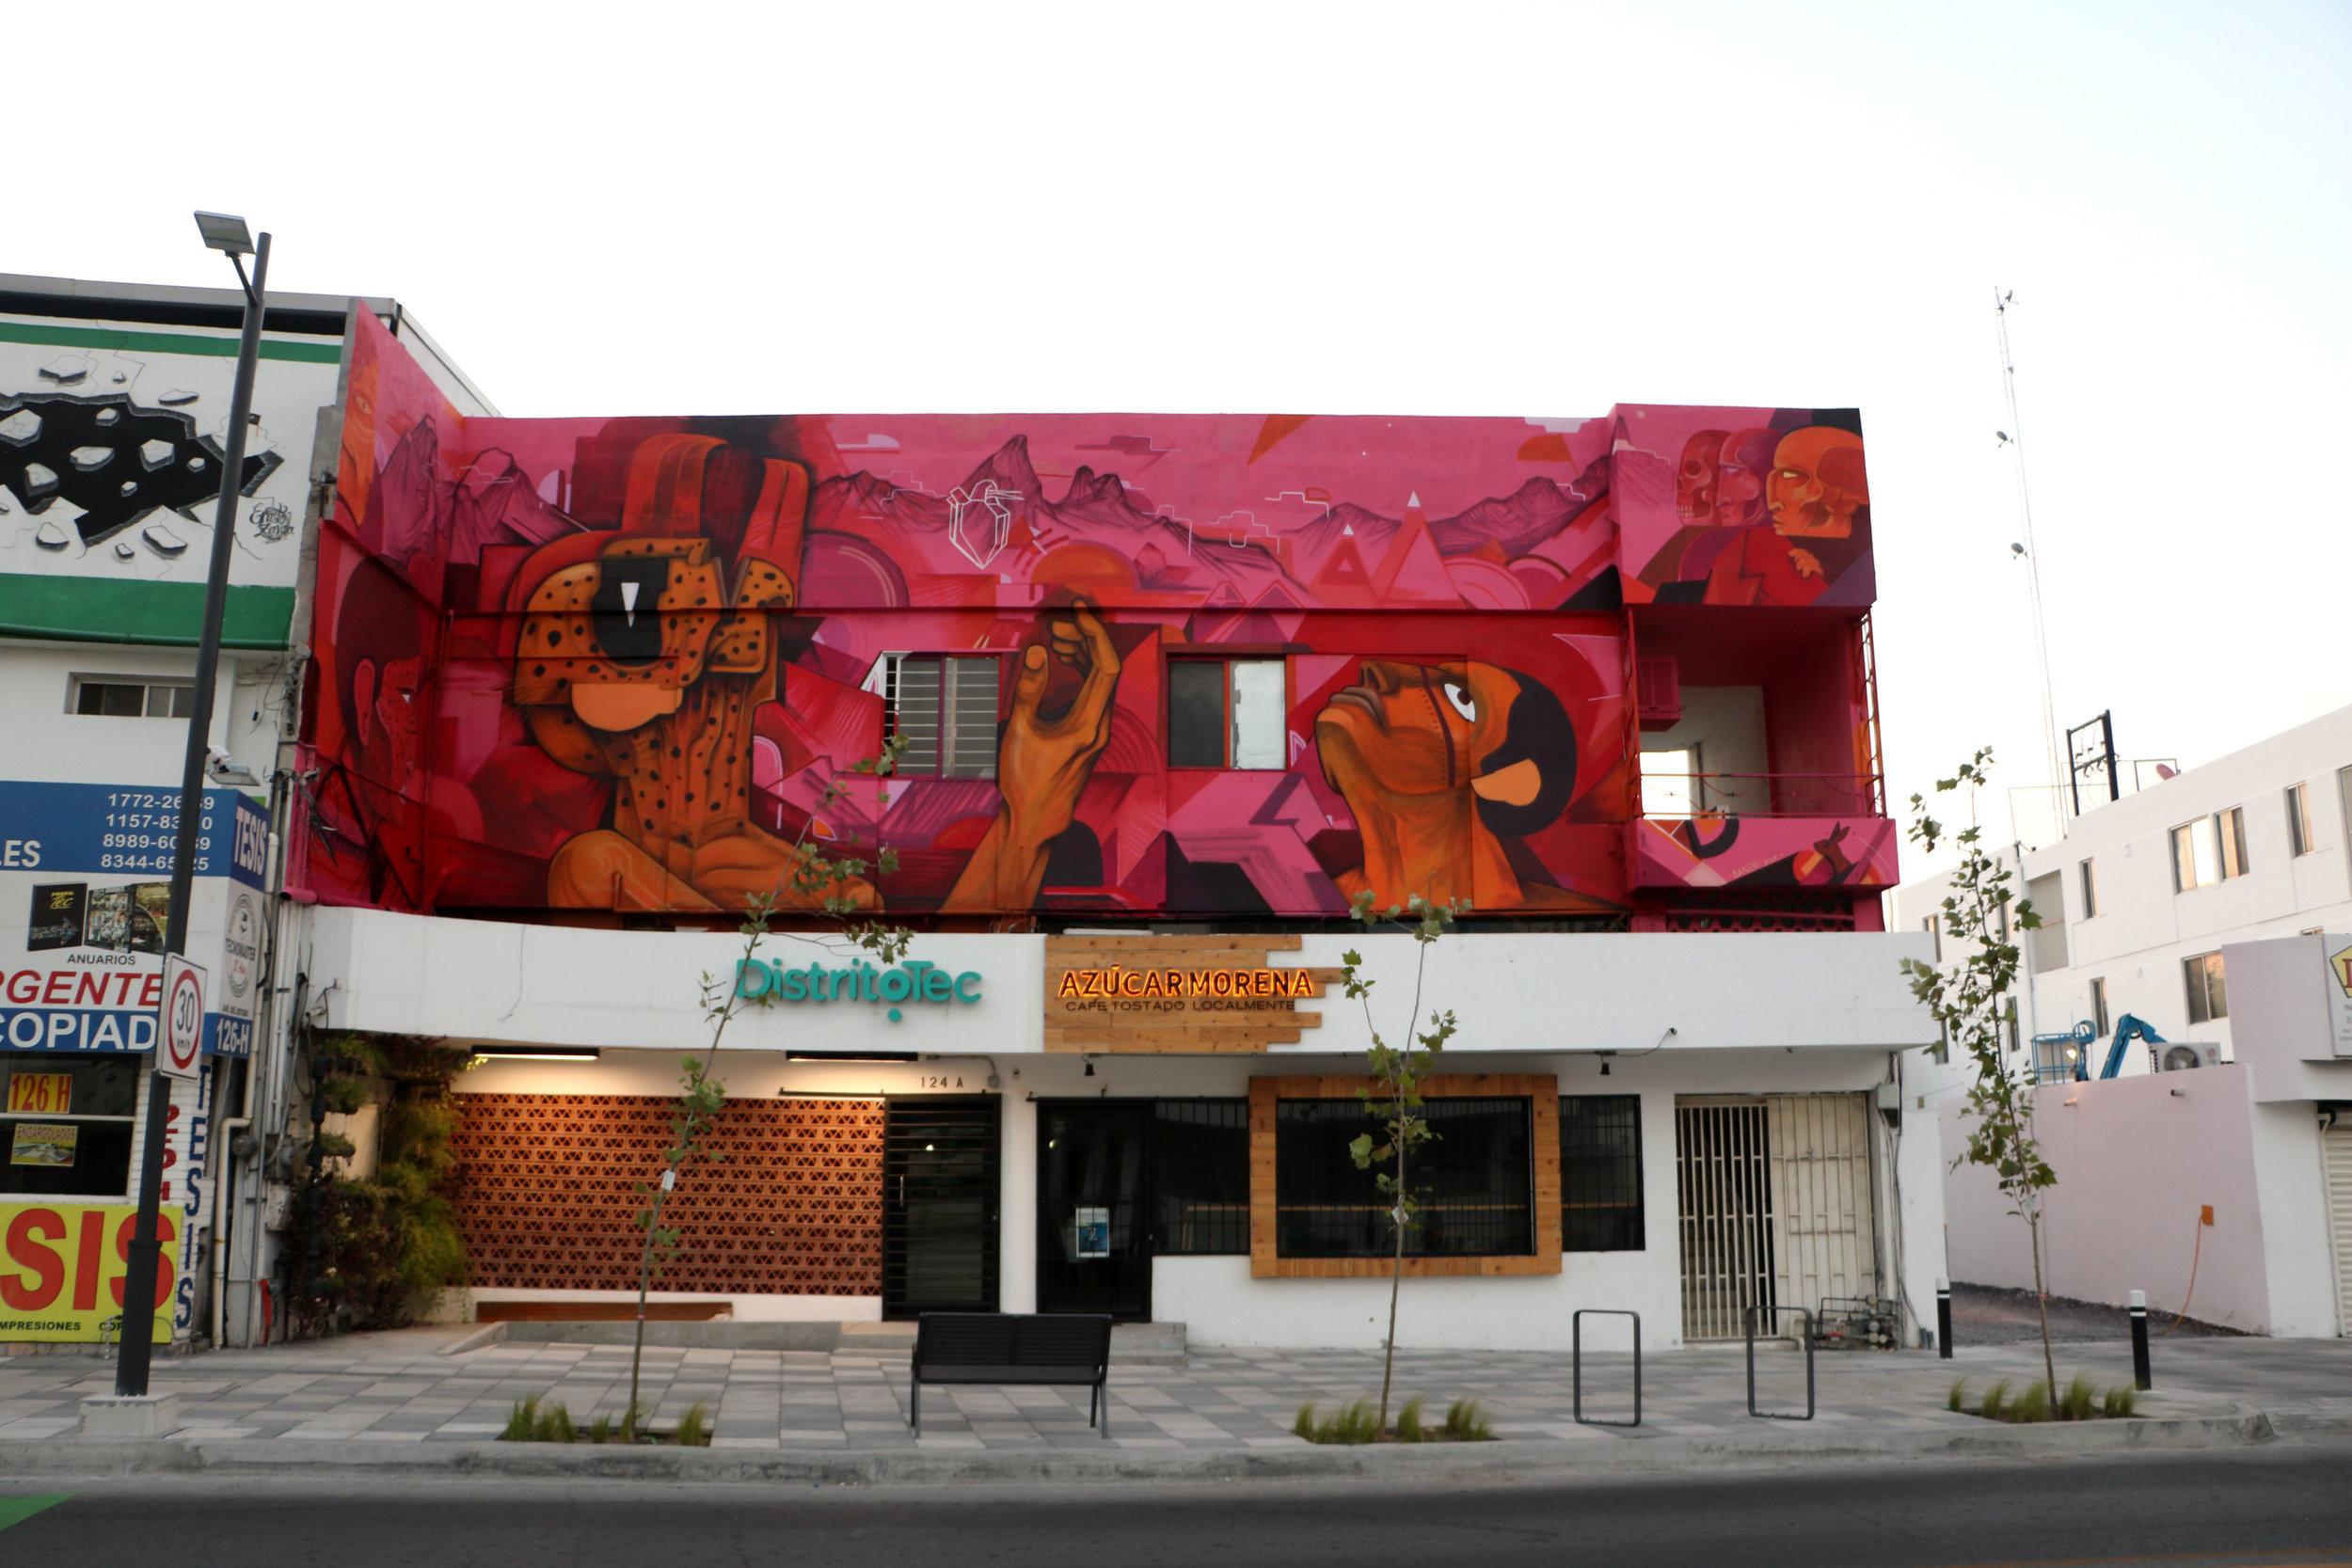 Mural art by Saner for Distrito Tec